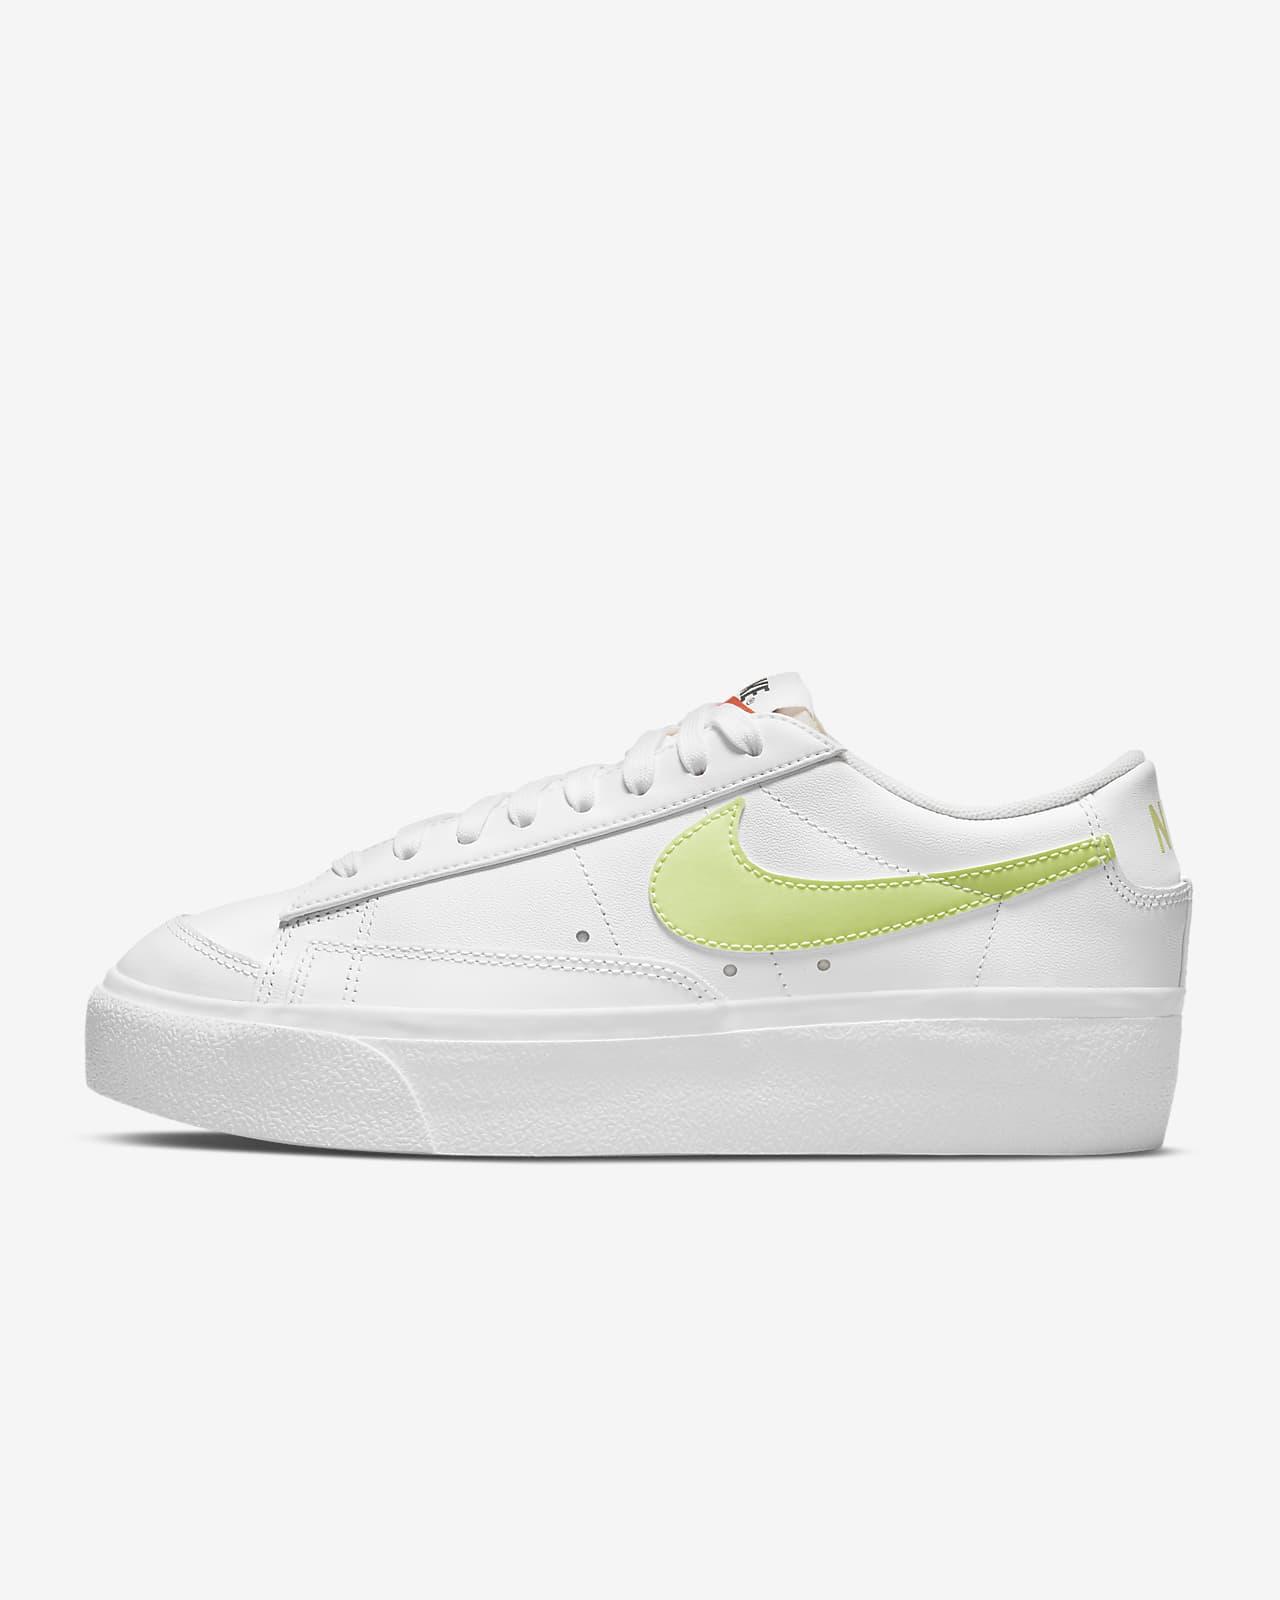 Sapatilhas Nike Blazer Low Platform para mulher